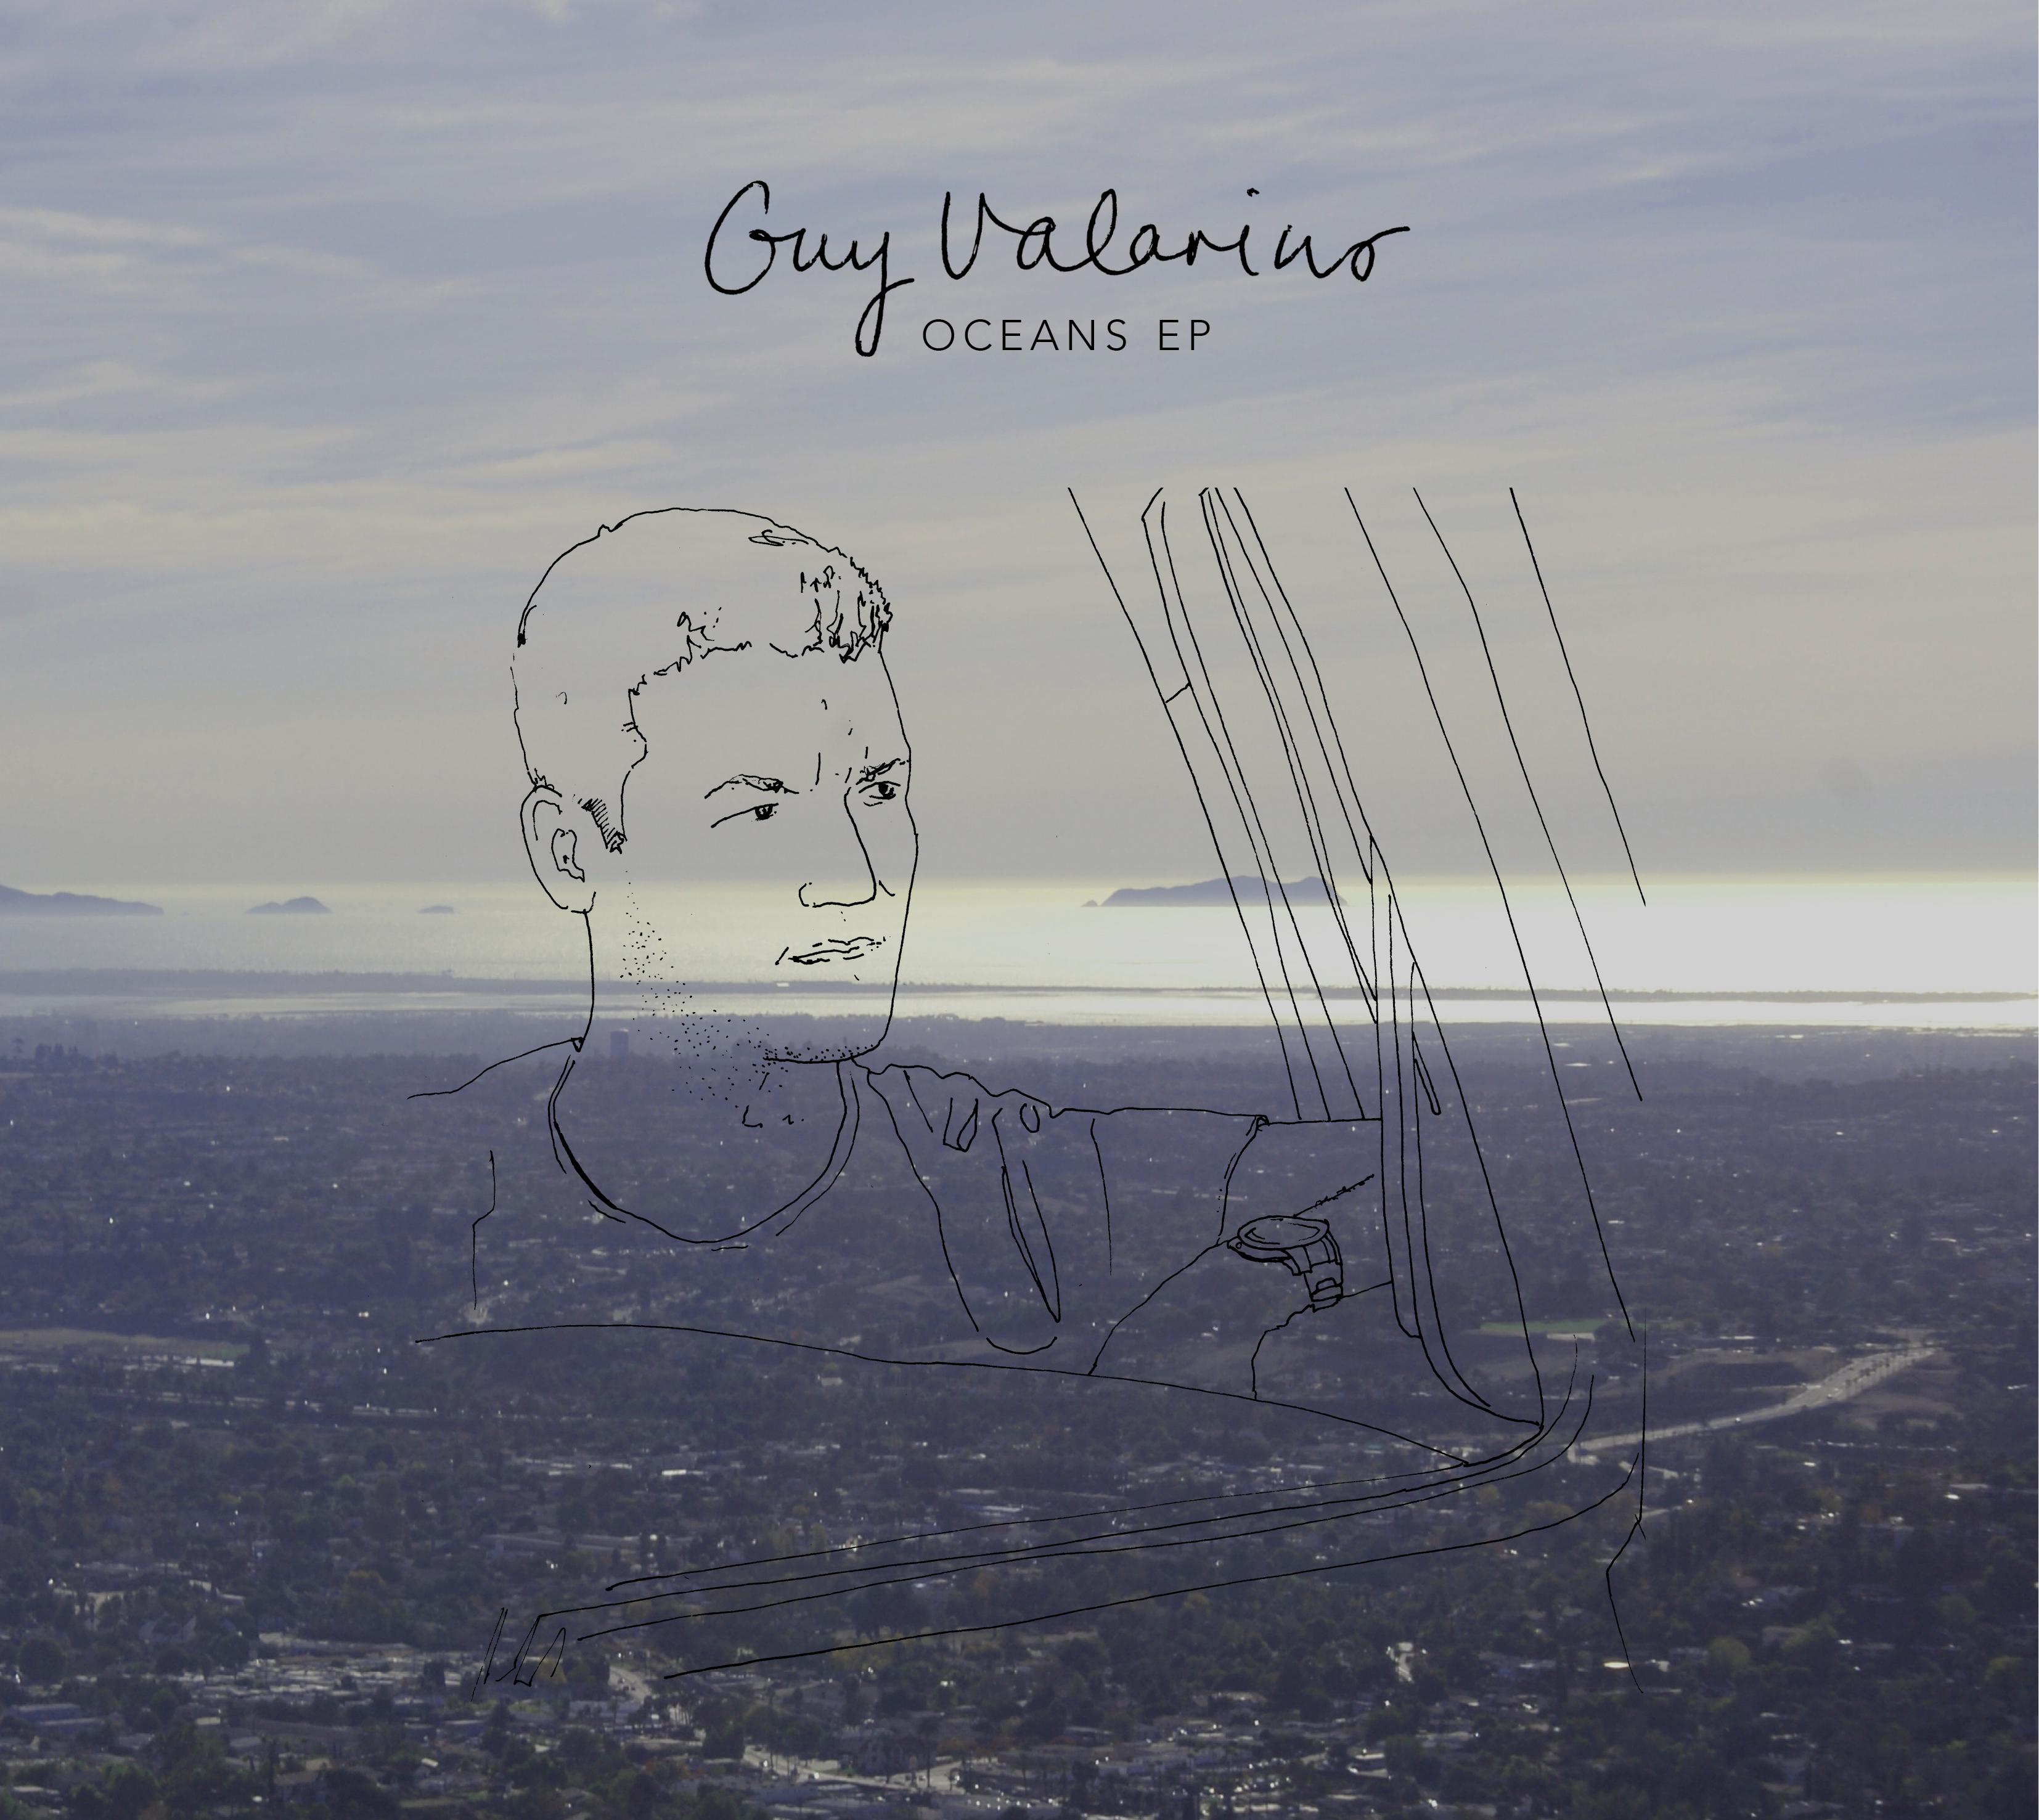 Oceans EP [CD] - Signed - Guy Valarino